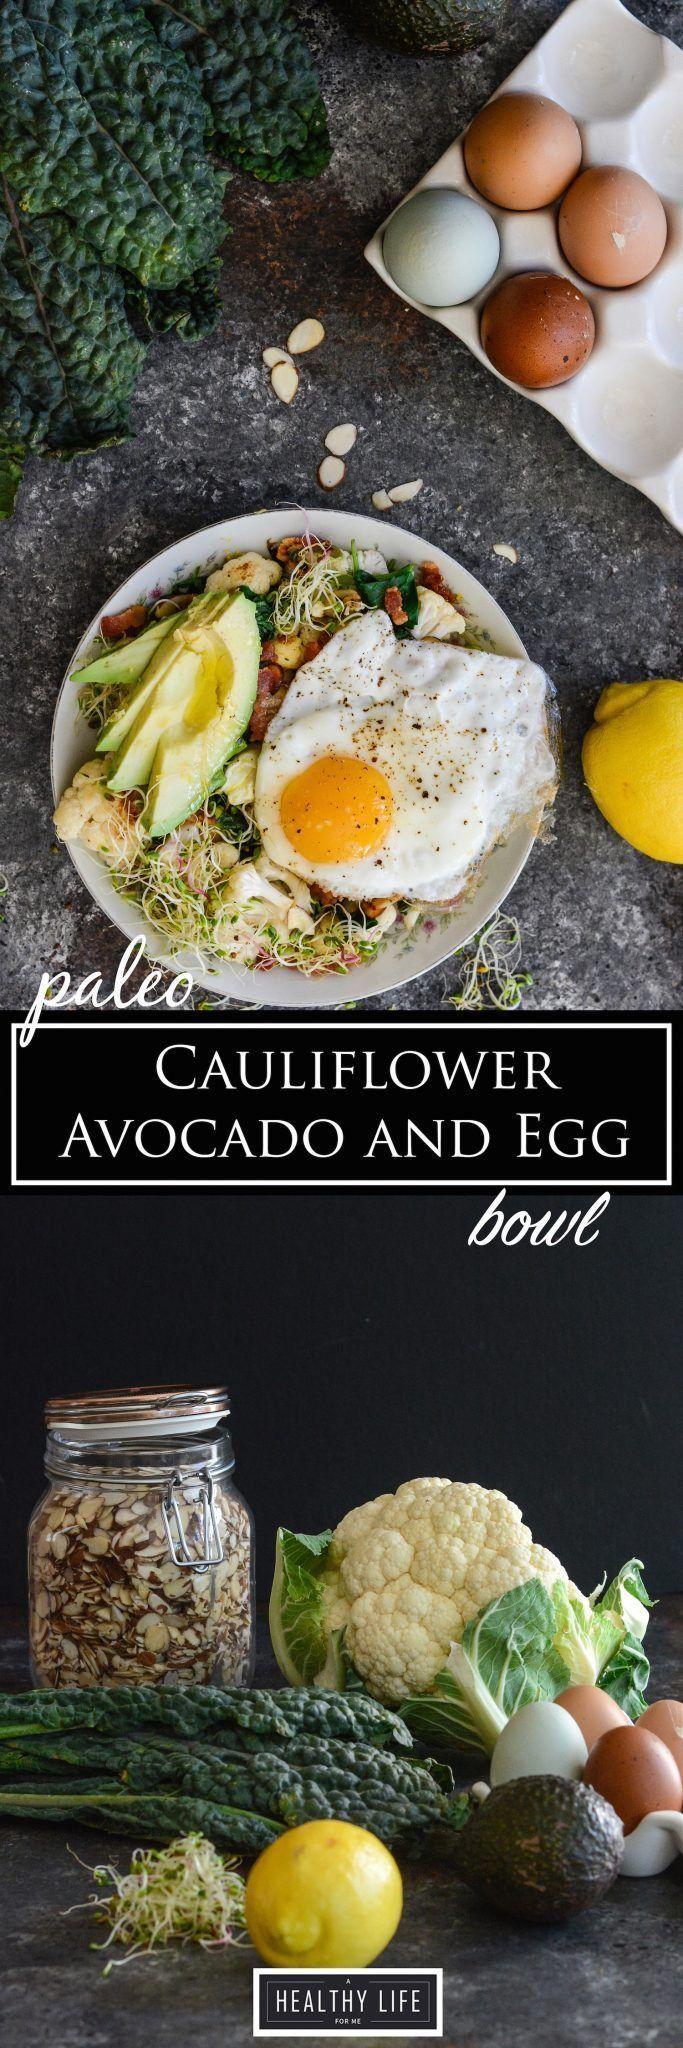 Paleo Cauliflower Avocado and Egg Bowl Recipe | Whole30 Recipe | Paleo Recipe | Gluten Free Recipe | Healthy Recipe | Bowl Recipe | Ready in less 30 Minutes